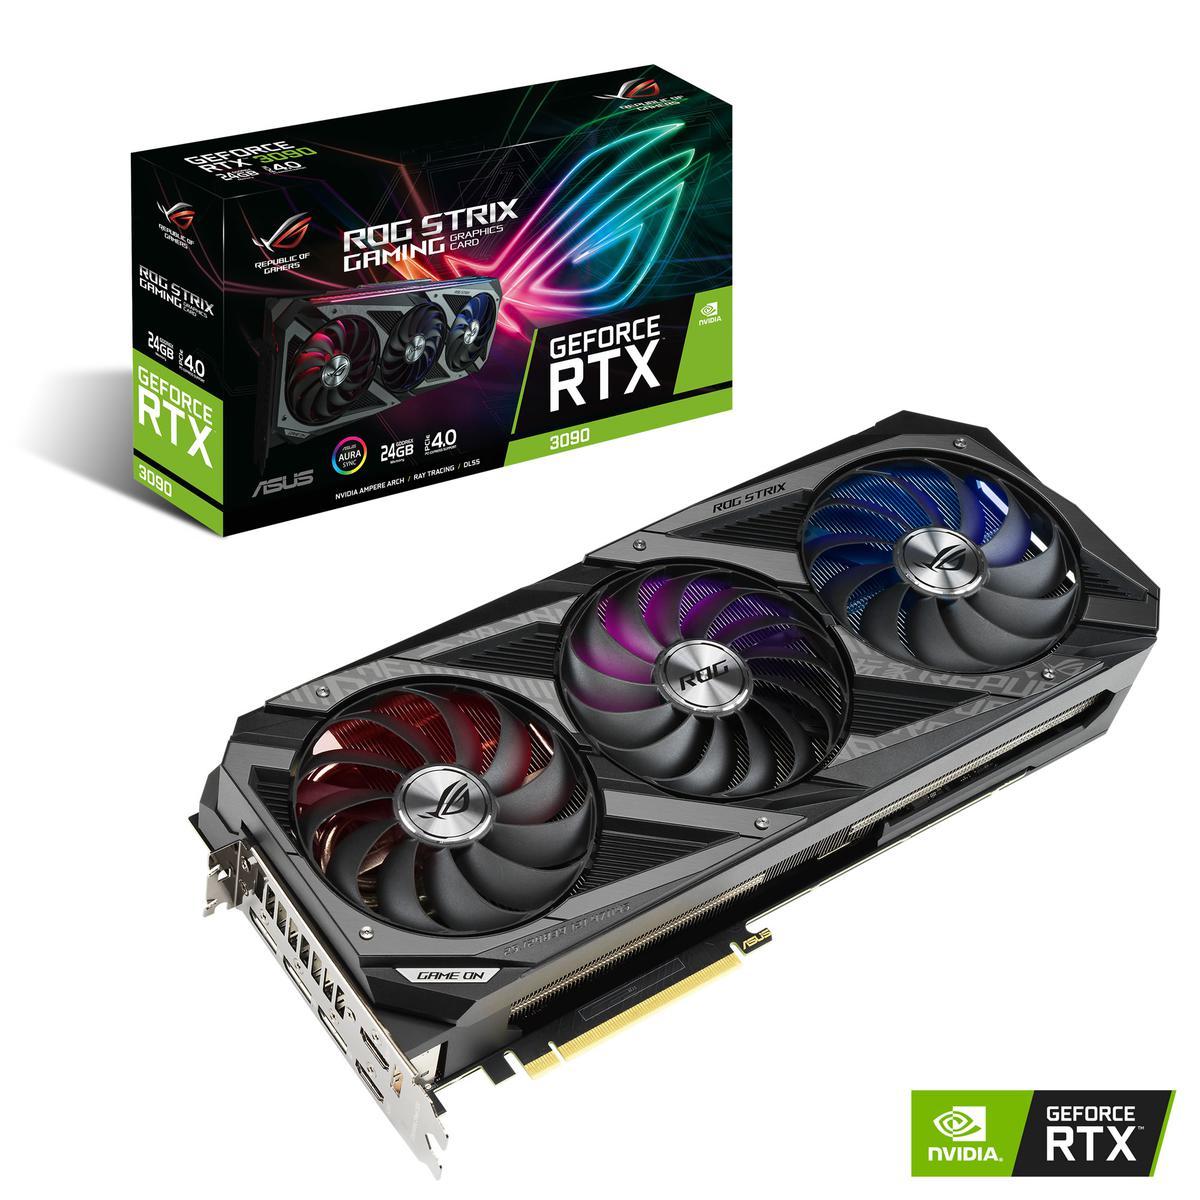 Asus GeForce RTX 3090 24 GB STRIX GAMING Video Card